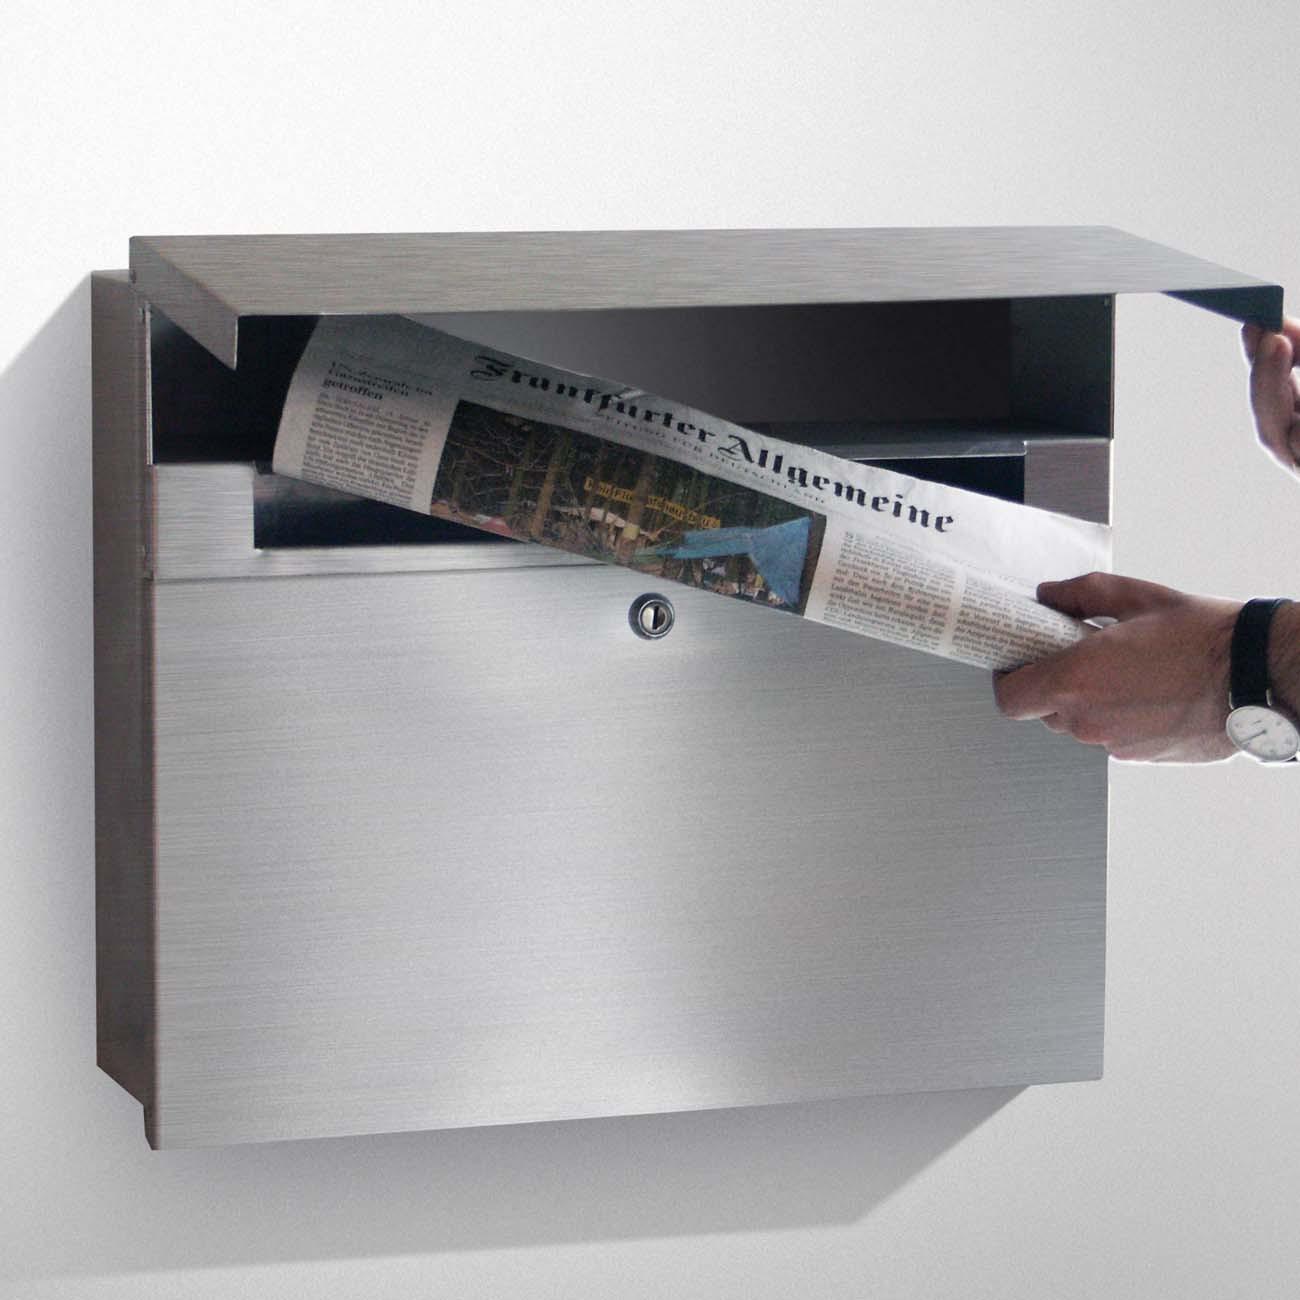 radius standbriefkasten letterman xxl 2 anthrazitgrau ral. Black Bedroom Furniture Sets. Home Design Ideas